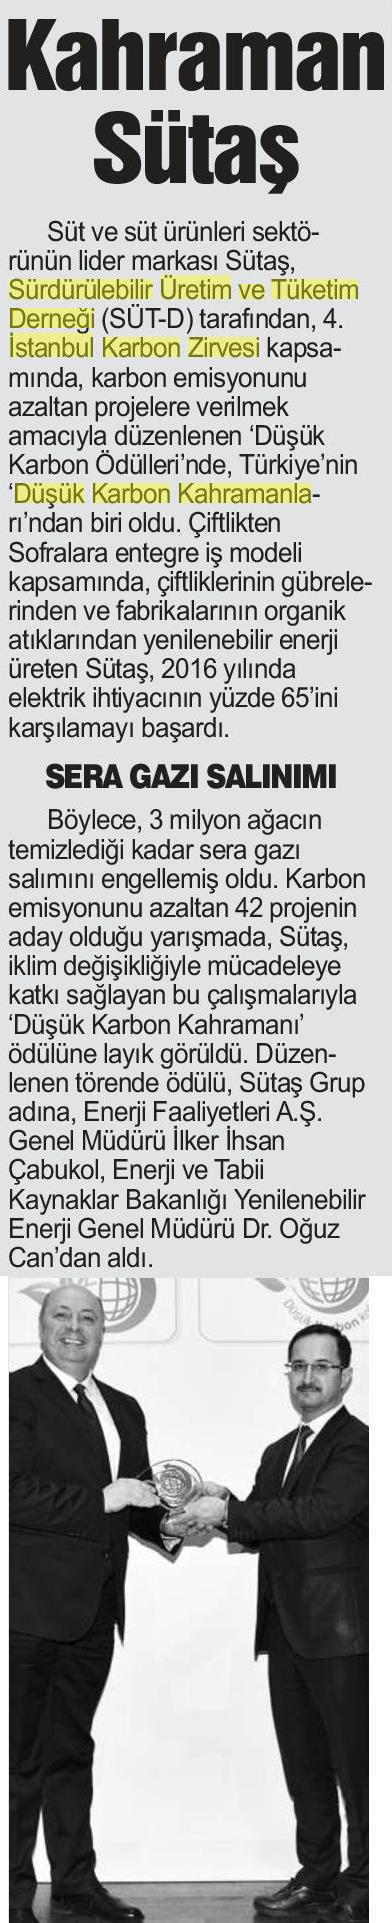 Kent Gazetesi Bursa 29.04.2017